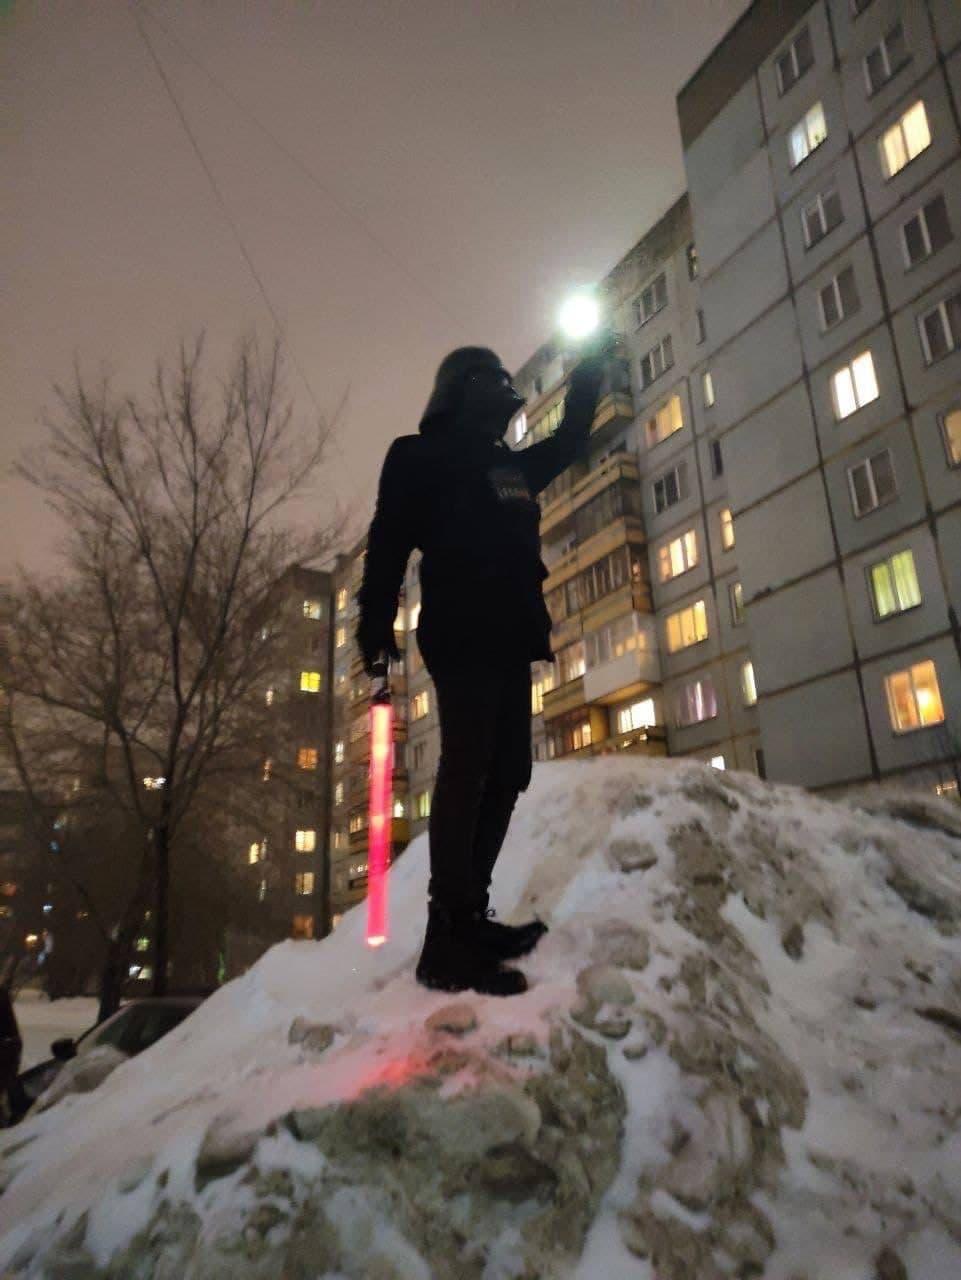 Дарт Вейдер тоже здесь! Покоряет кучу снега